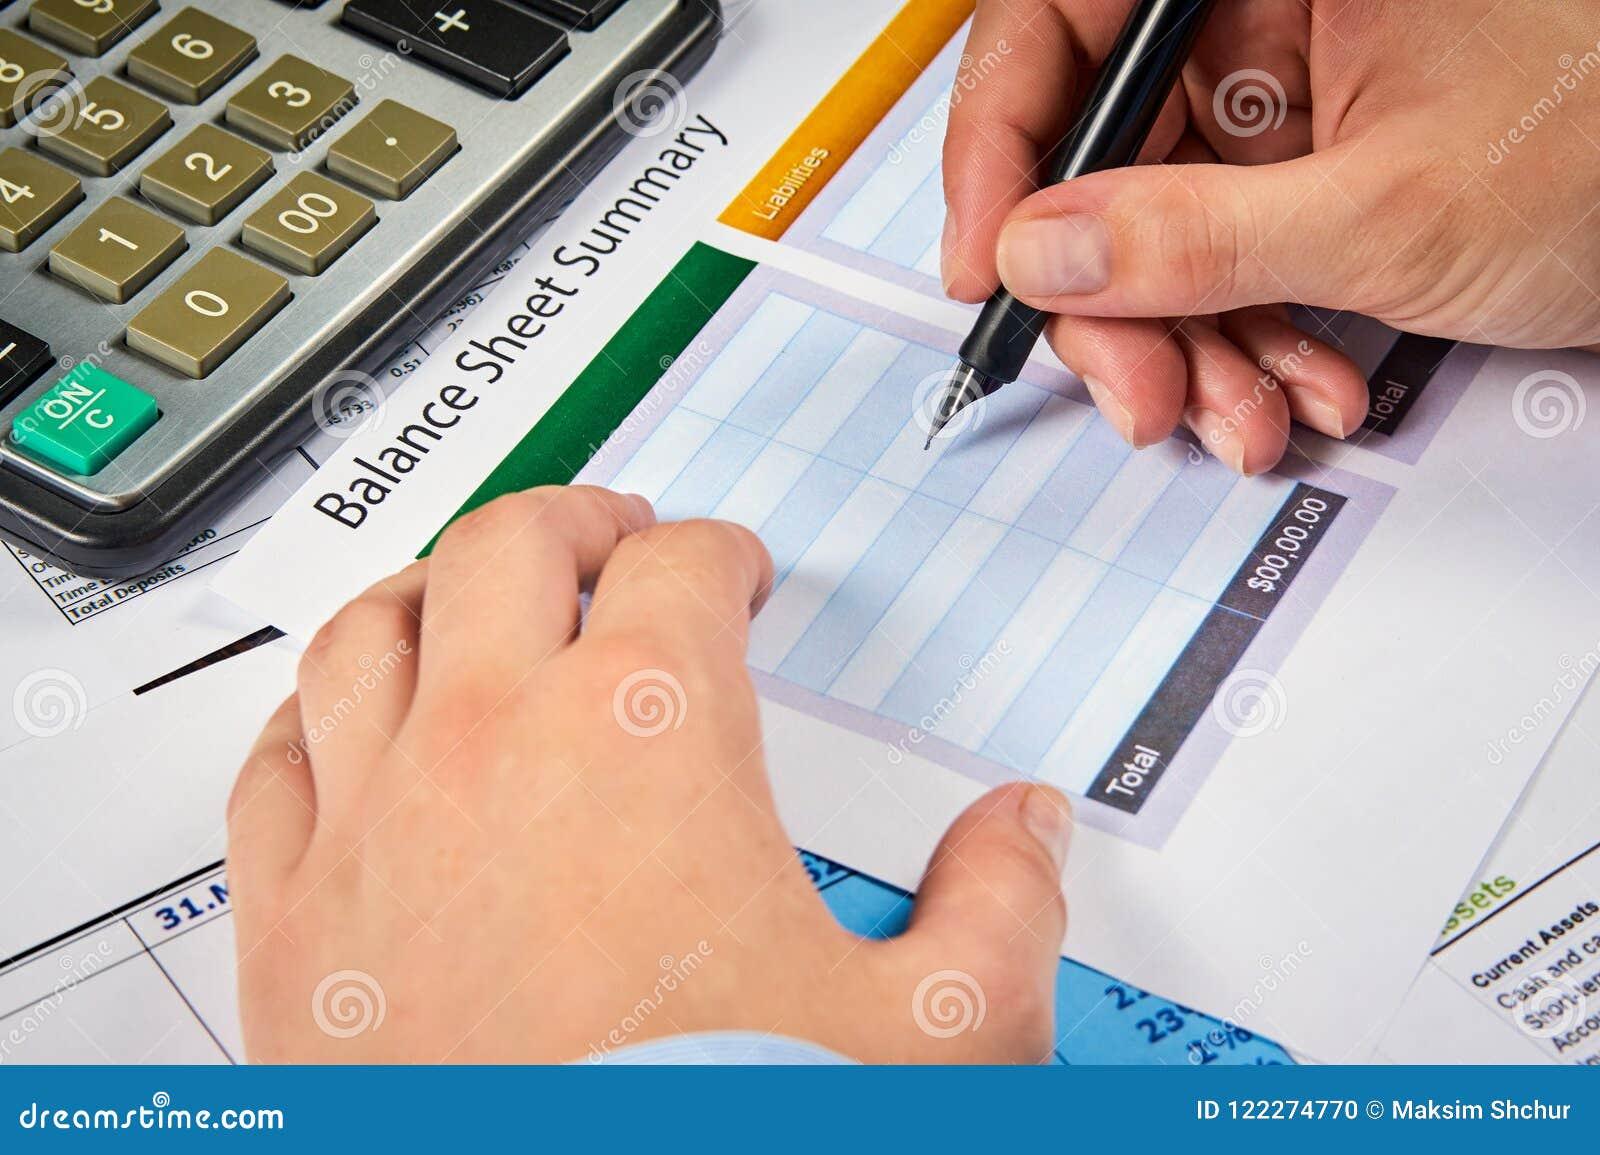 write in balance sheet summary stock photo image of accounts